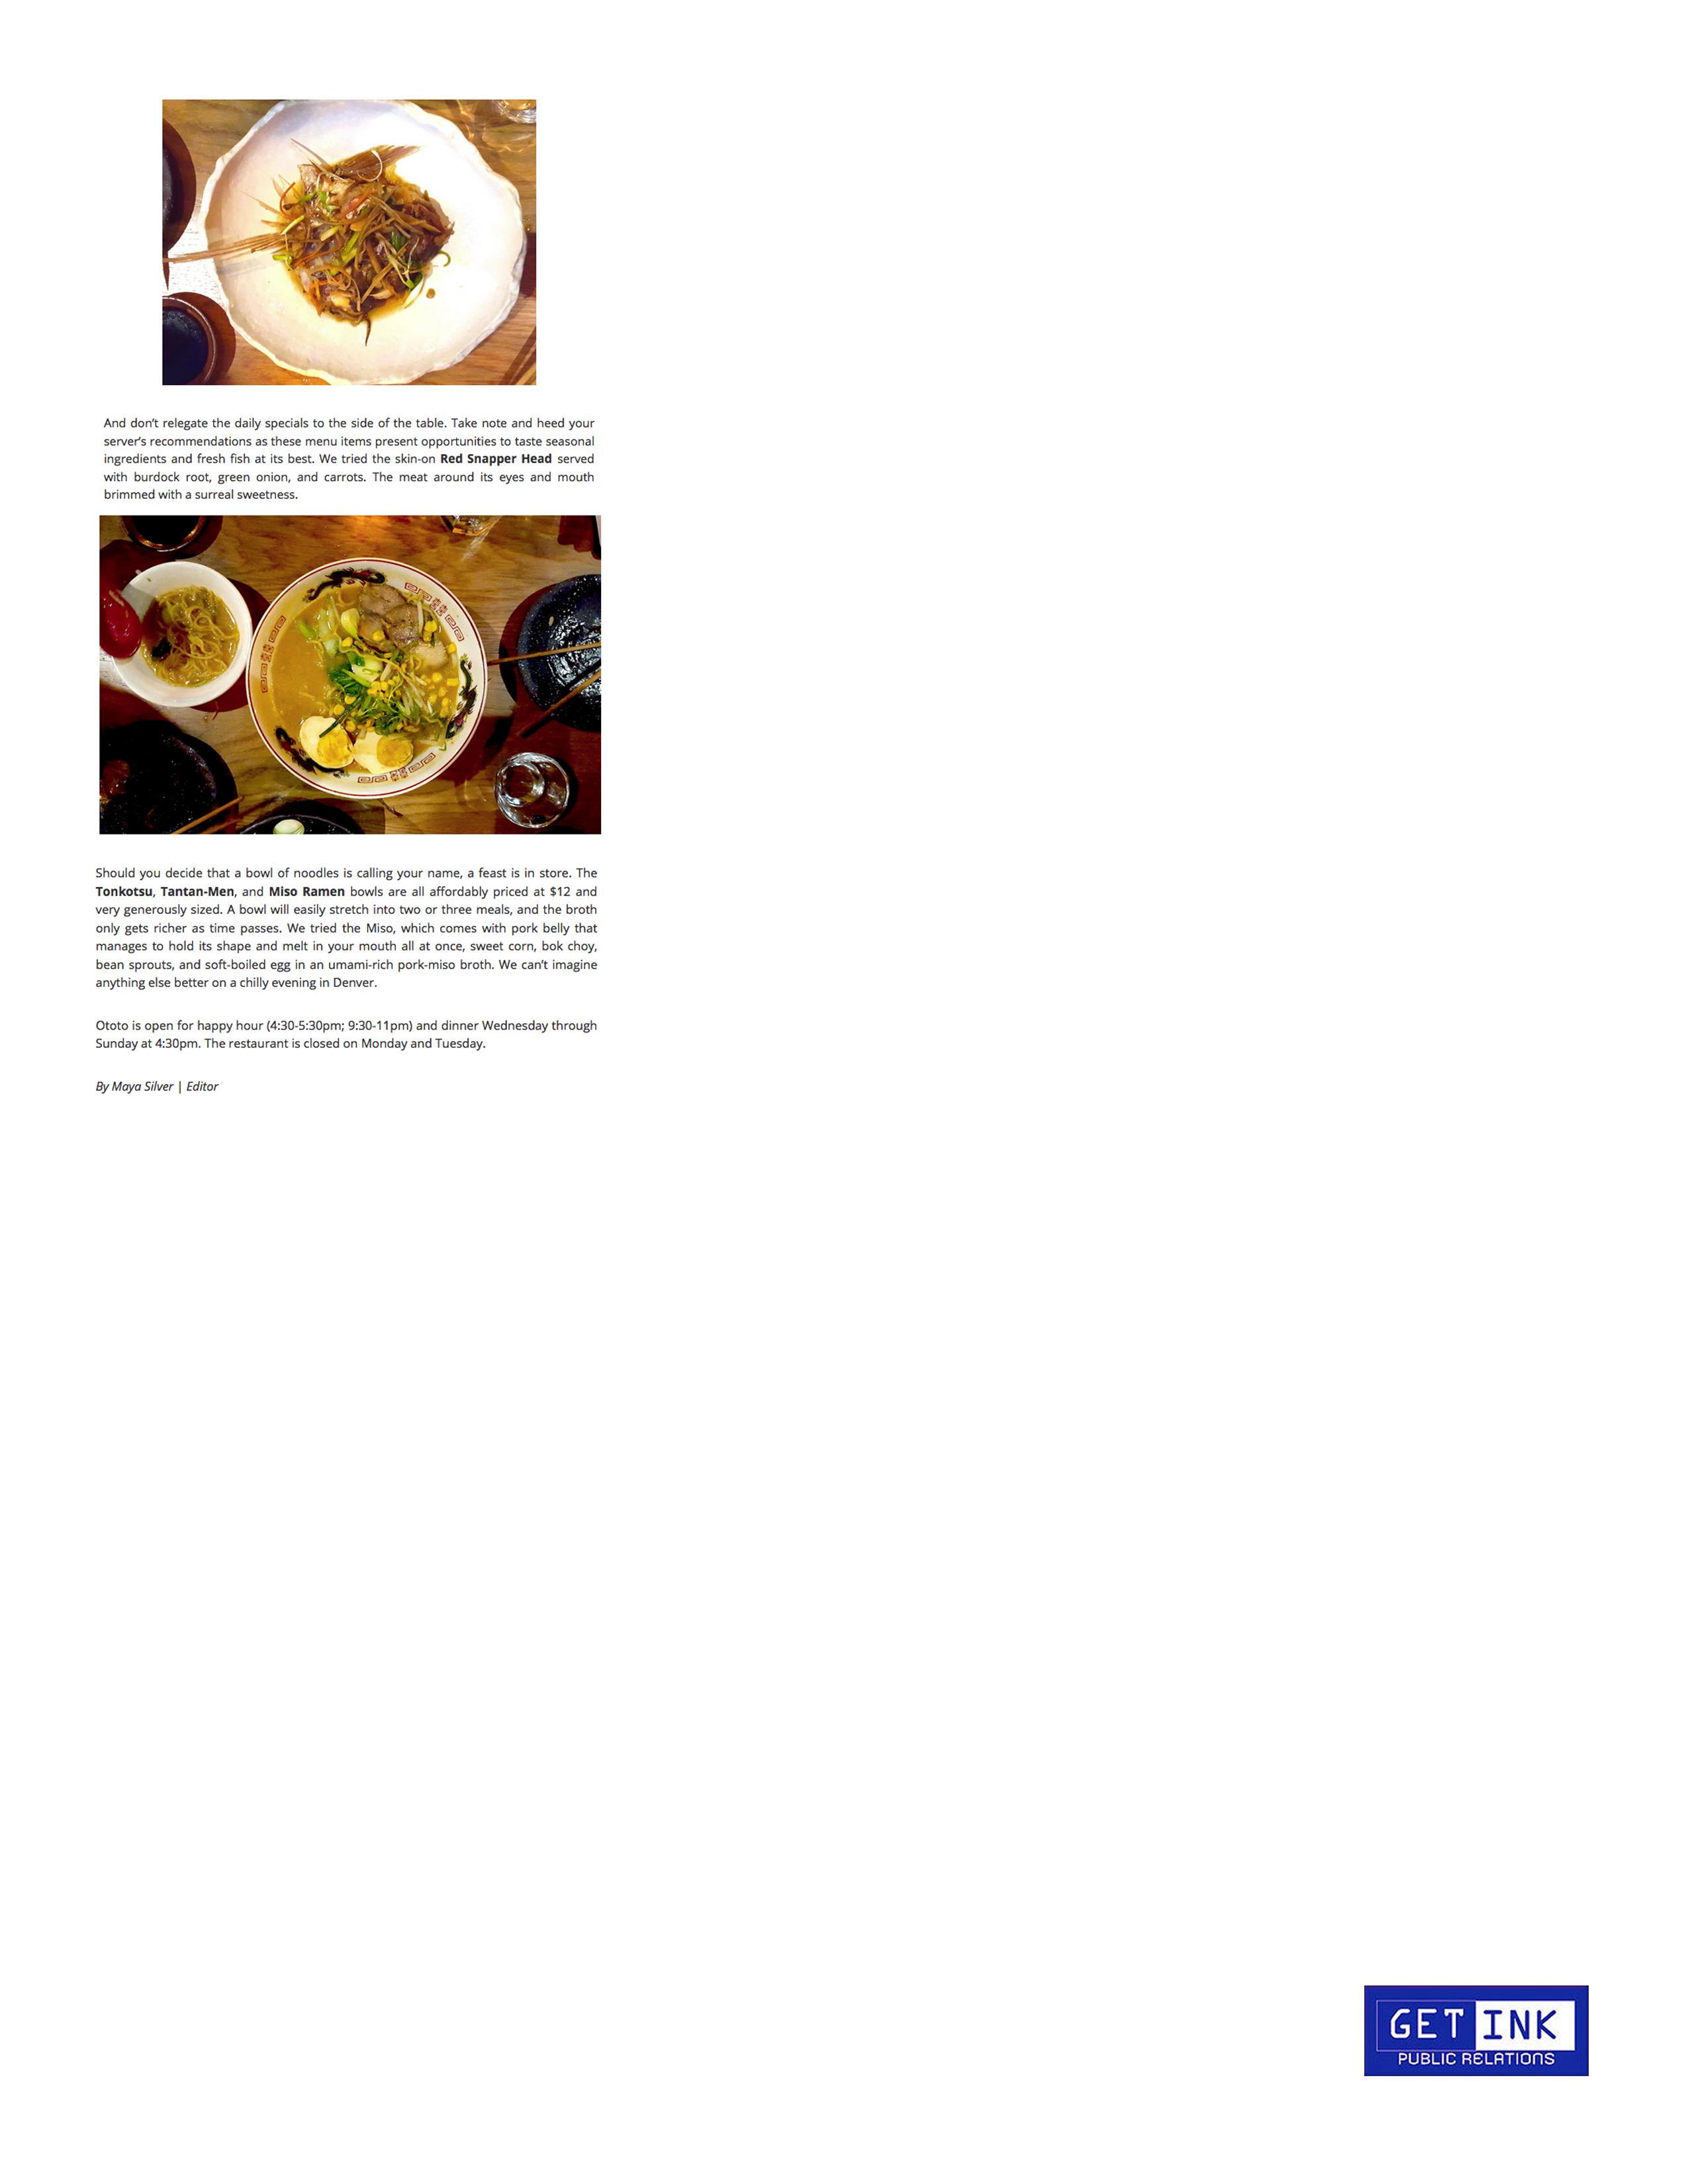 DiningOut.com 10.9.15 Part 2